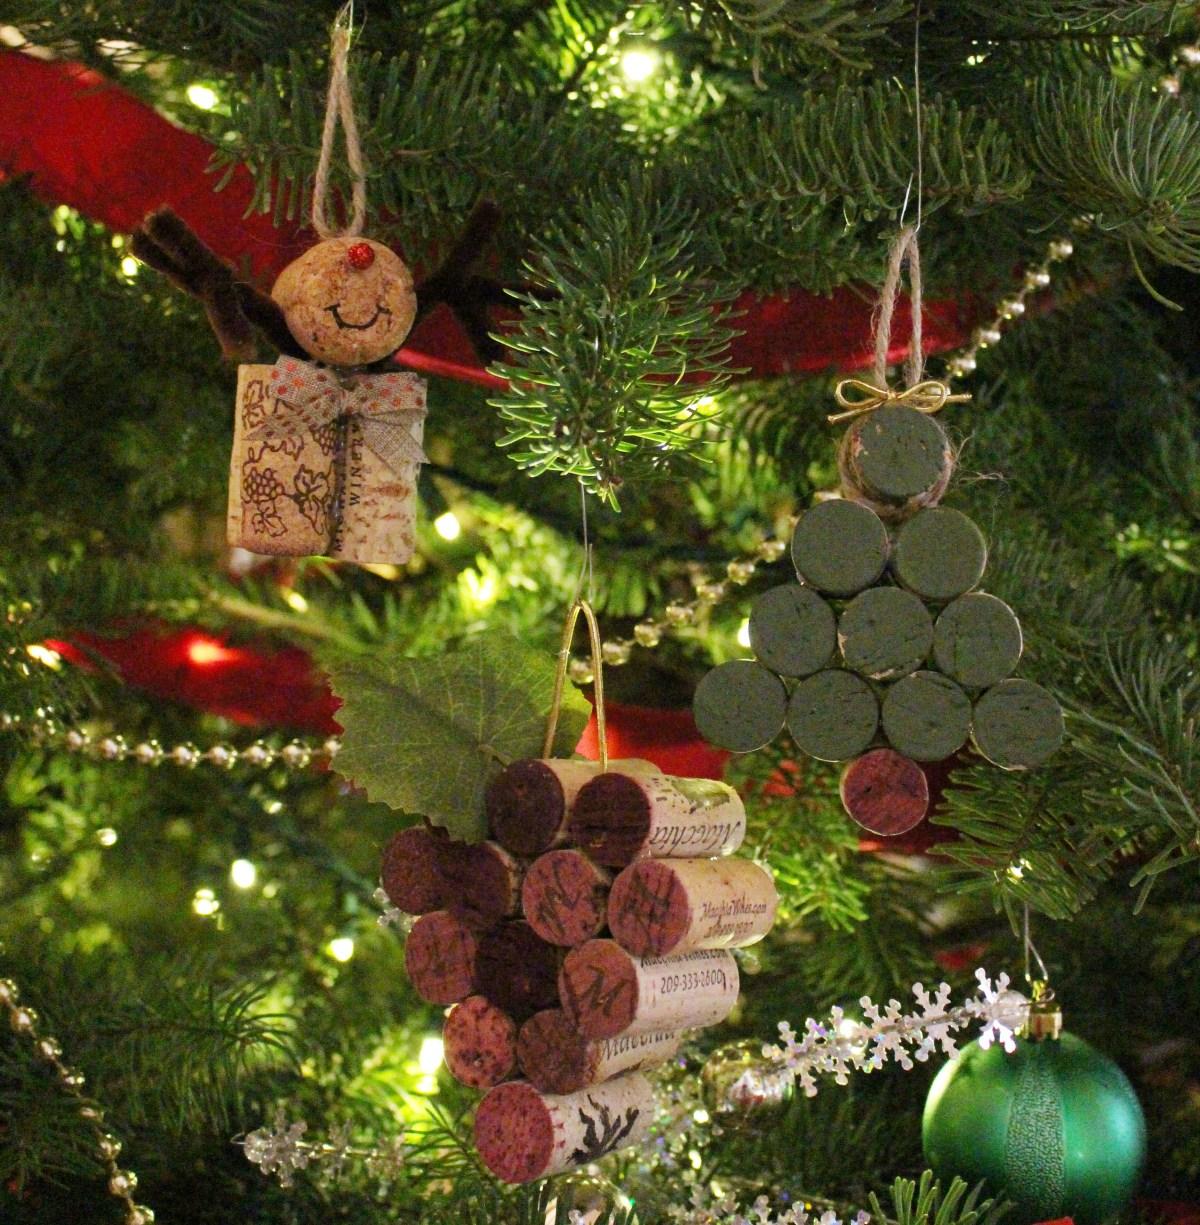 cork ornaments reindeer Christmas tree grapes easy craft